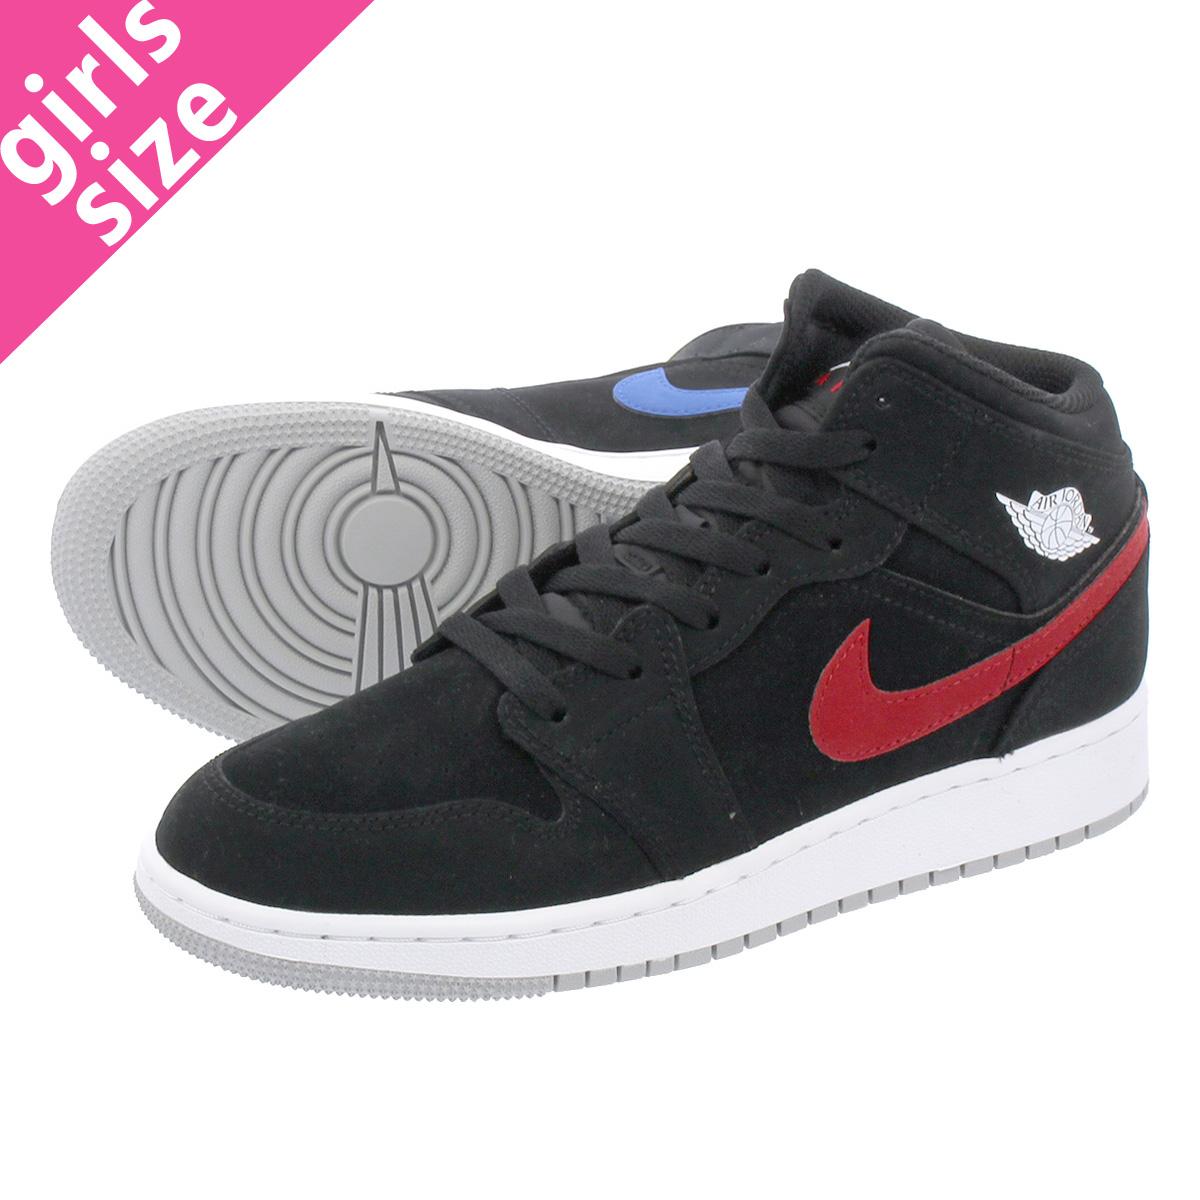 look for 562ea 09fb7 NIKE AIR JORDAN 1 MID BG Nike Air Jordan 1 mid BG BLACK WHITE RED YELLOW BLUE GREEN  554,725-065